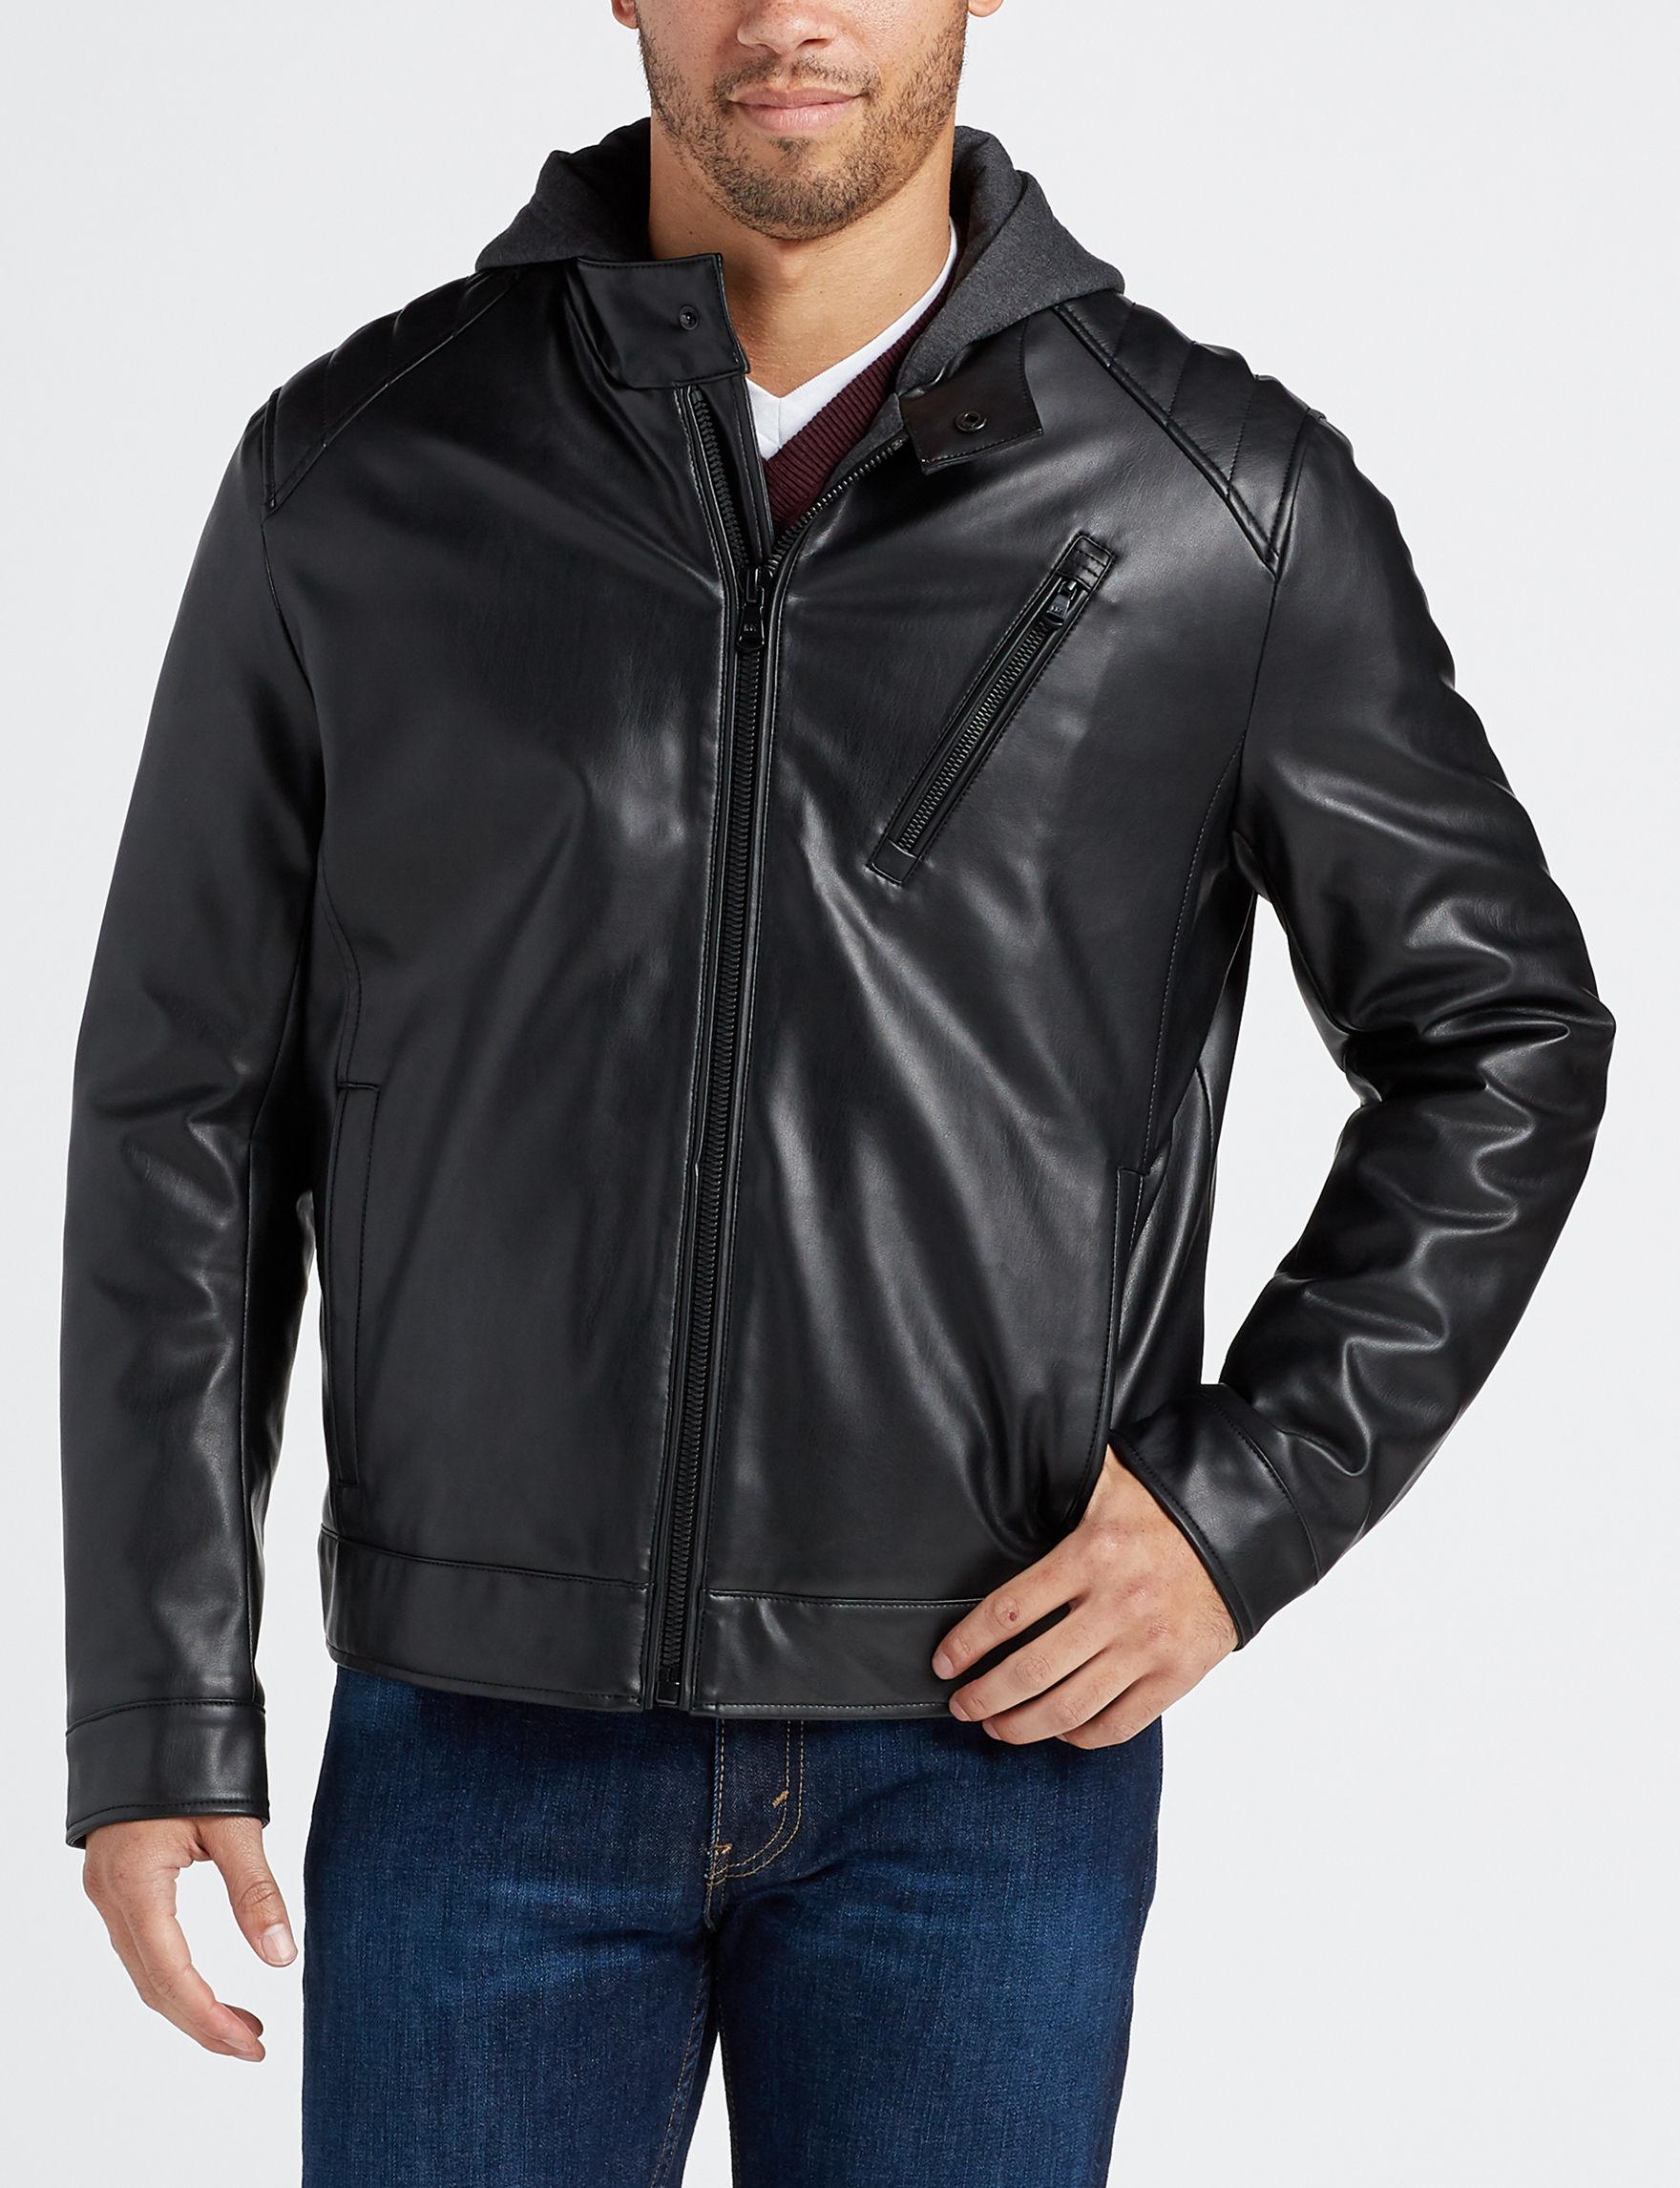 Michael Kors Black / Grey Bomber & Moto Jackets